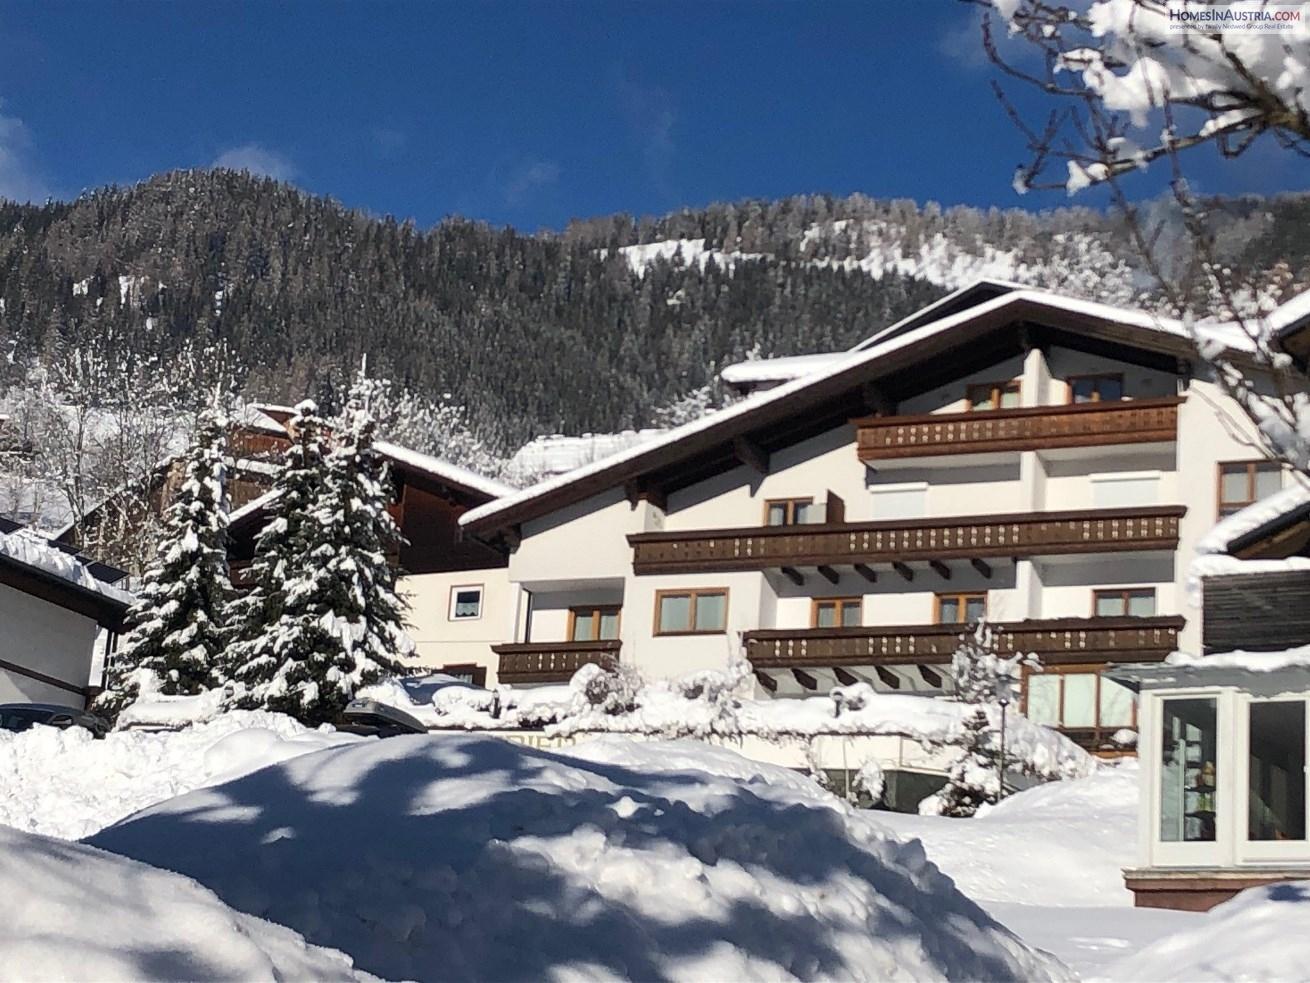 Bad Kleinkirchheim, Studio Apartment (ARRIGO) 30m2, Balcony, great views